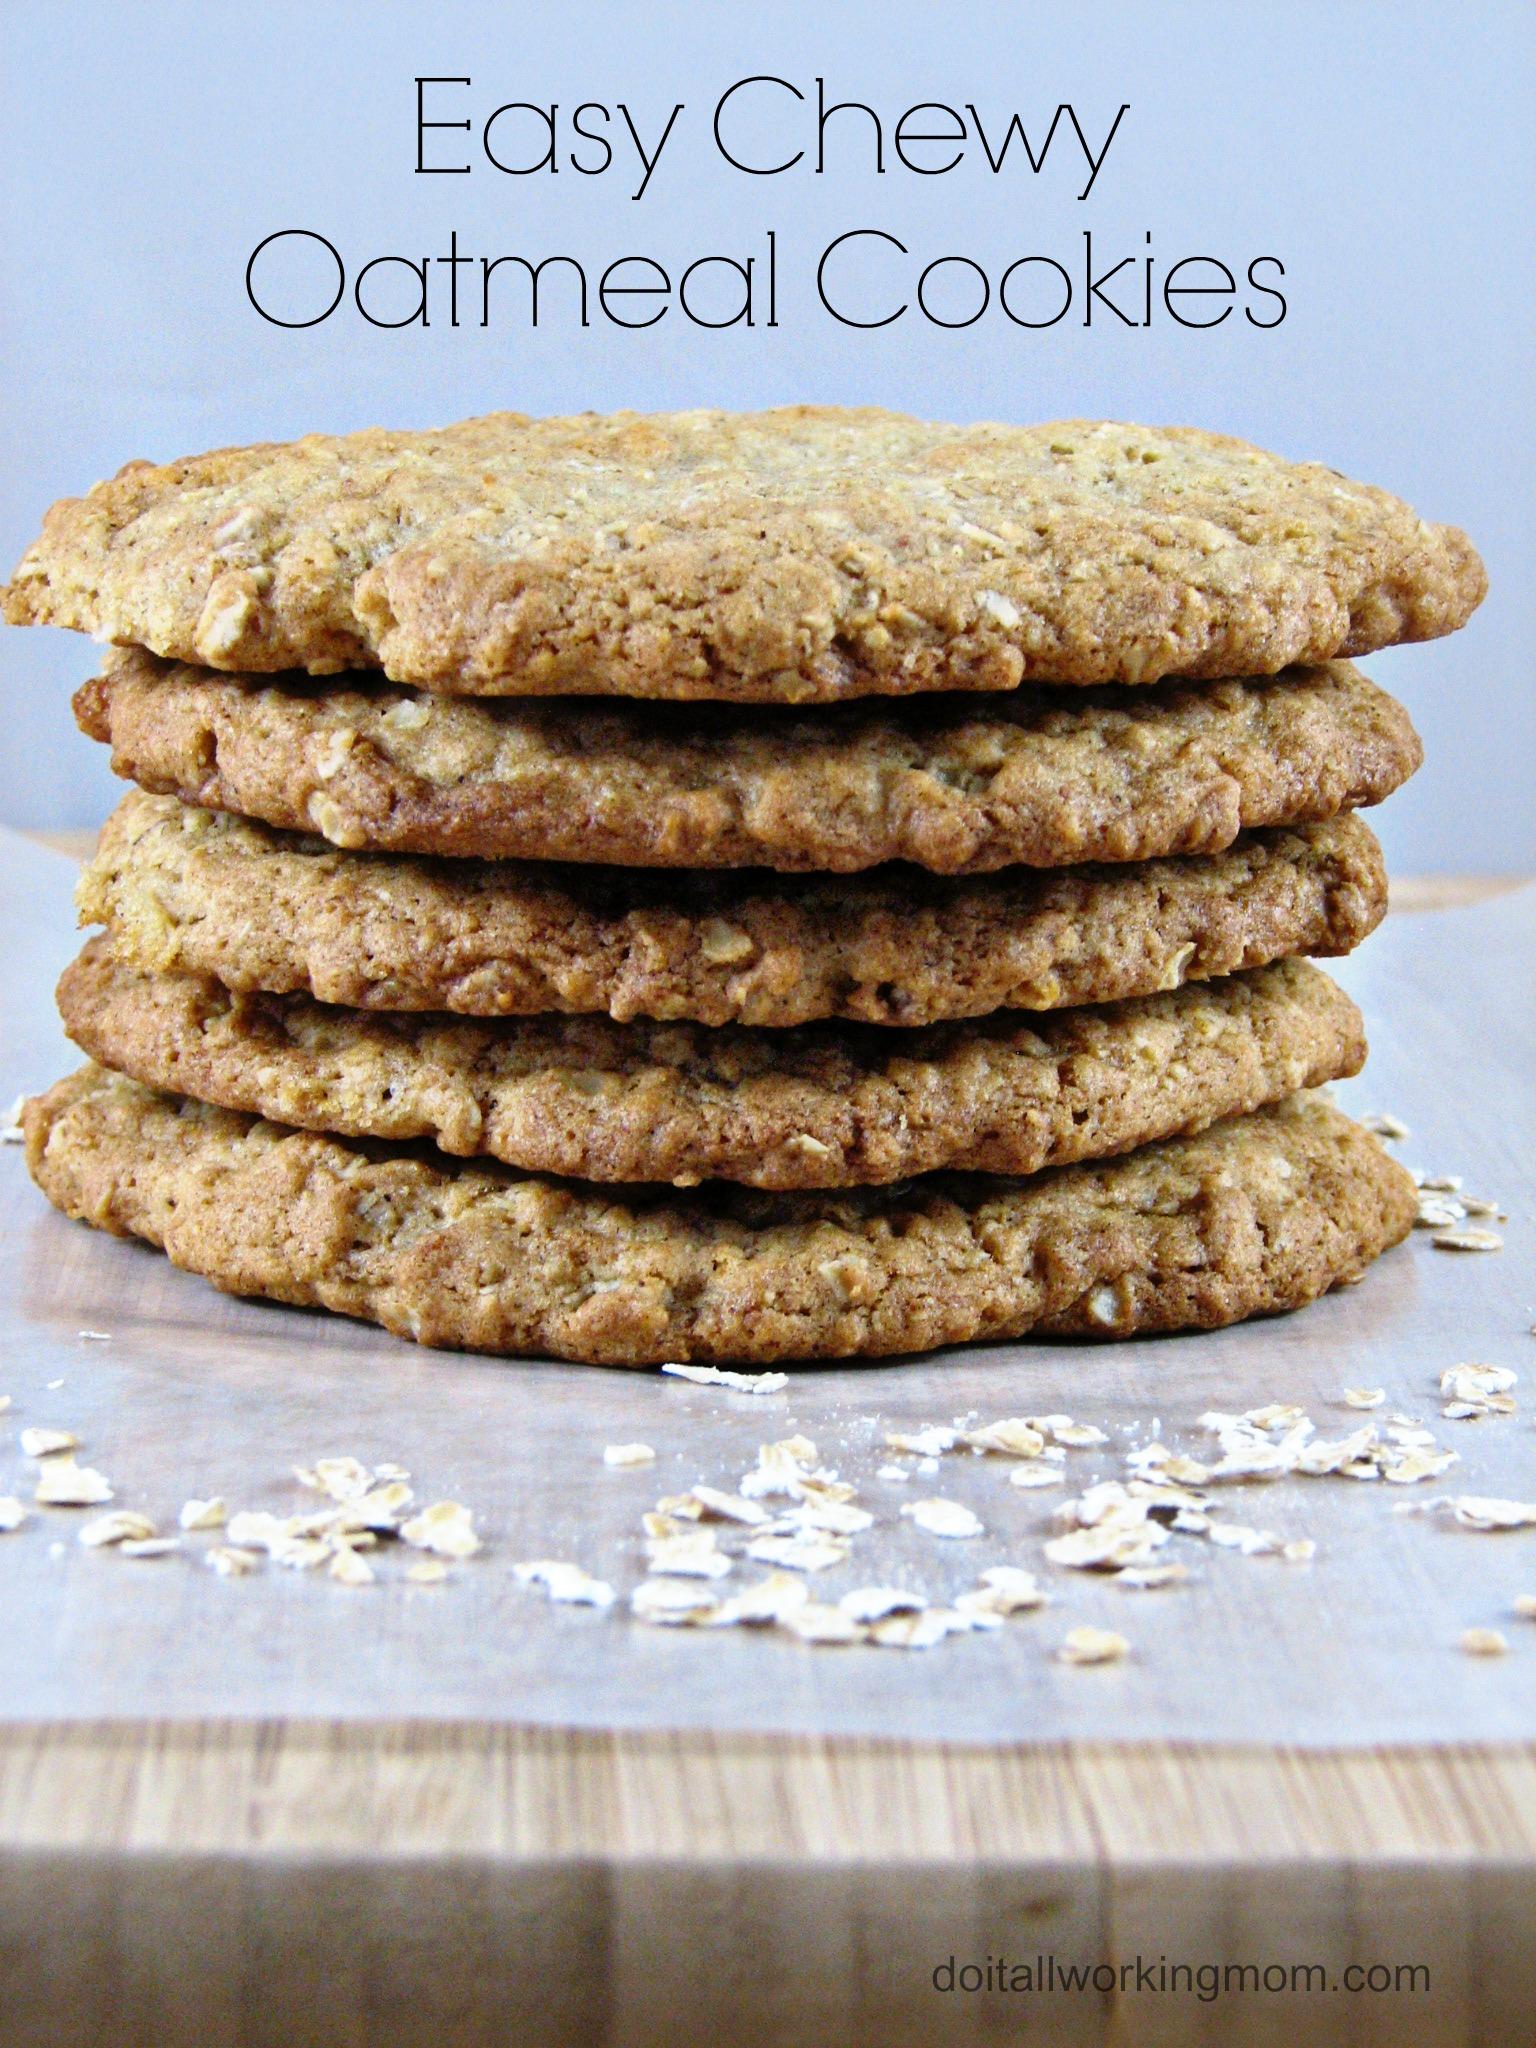 Easy Chewy Oatmeal Cookies